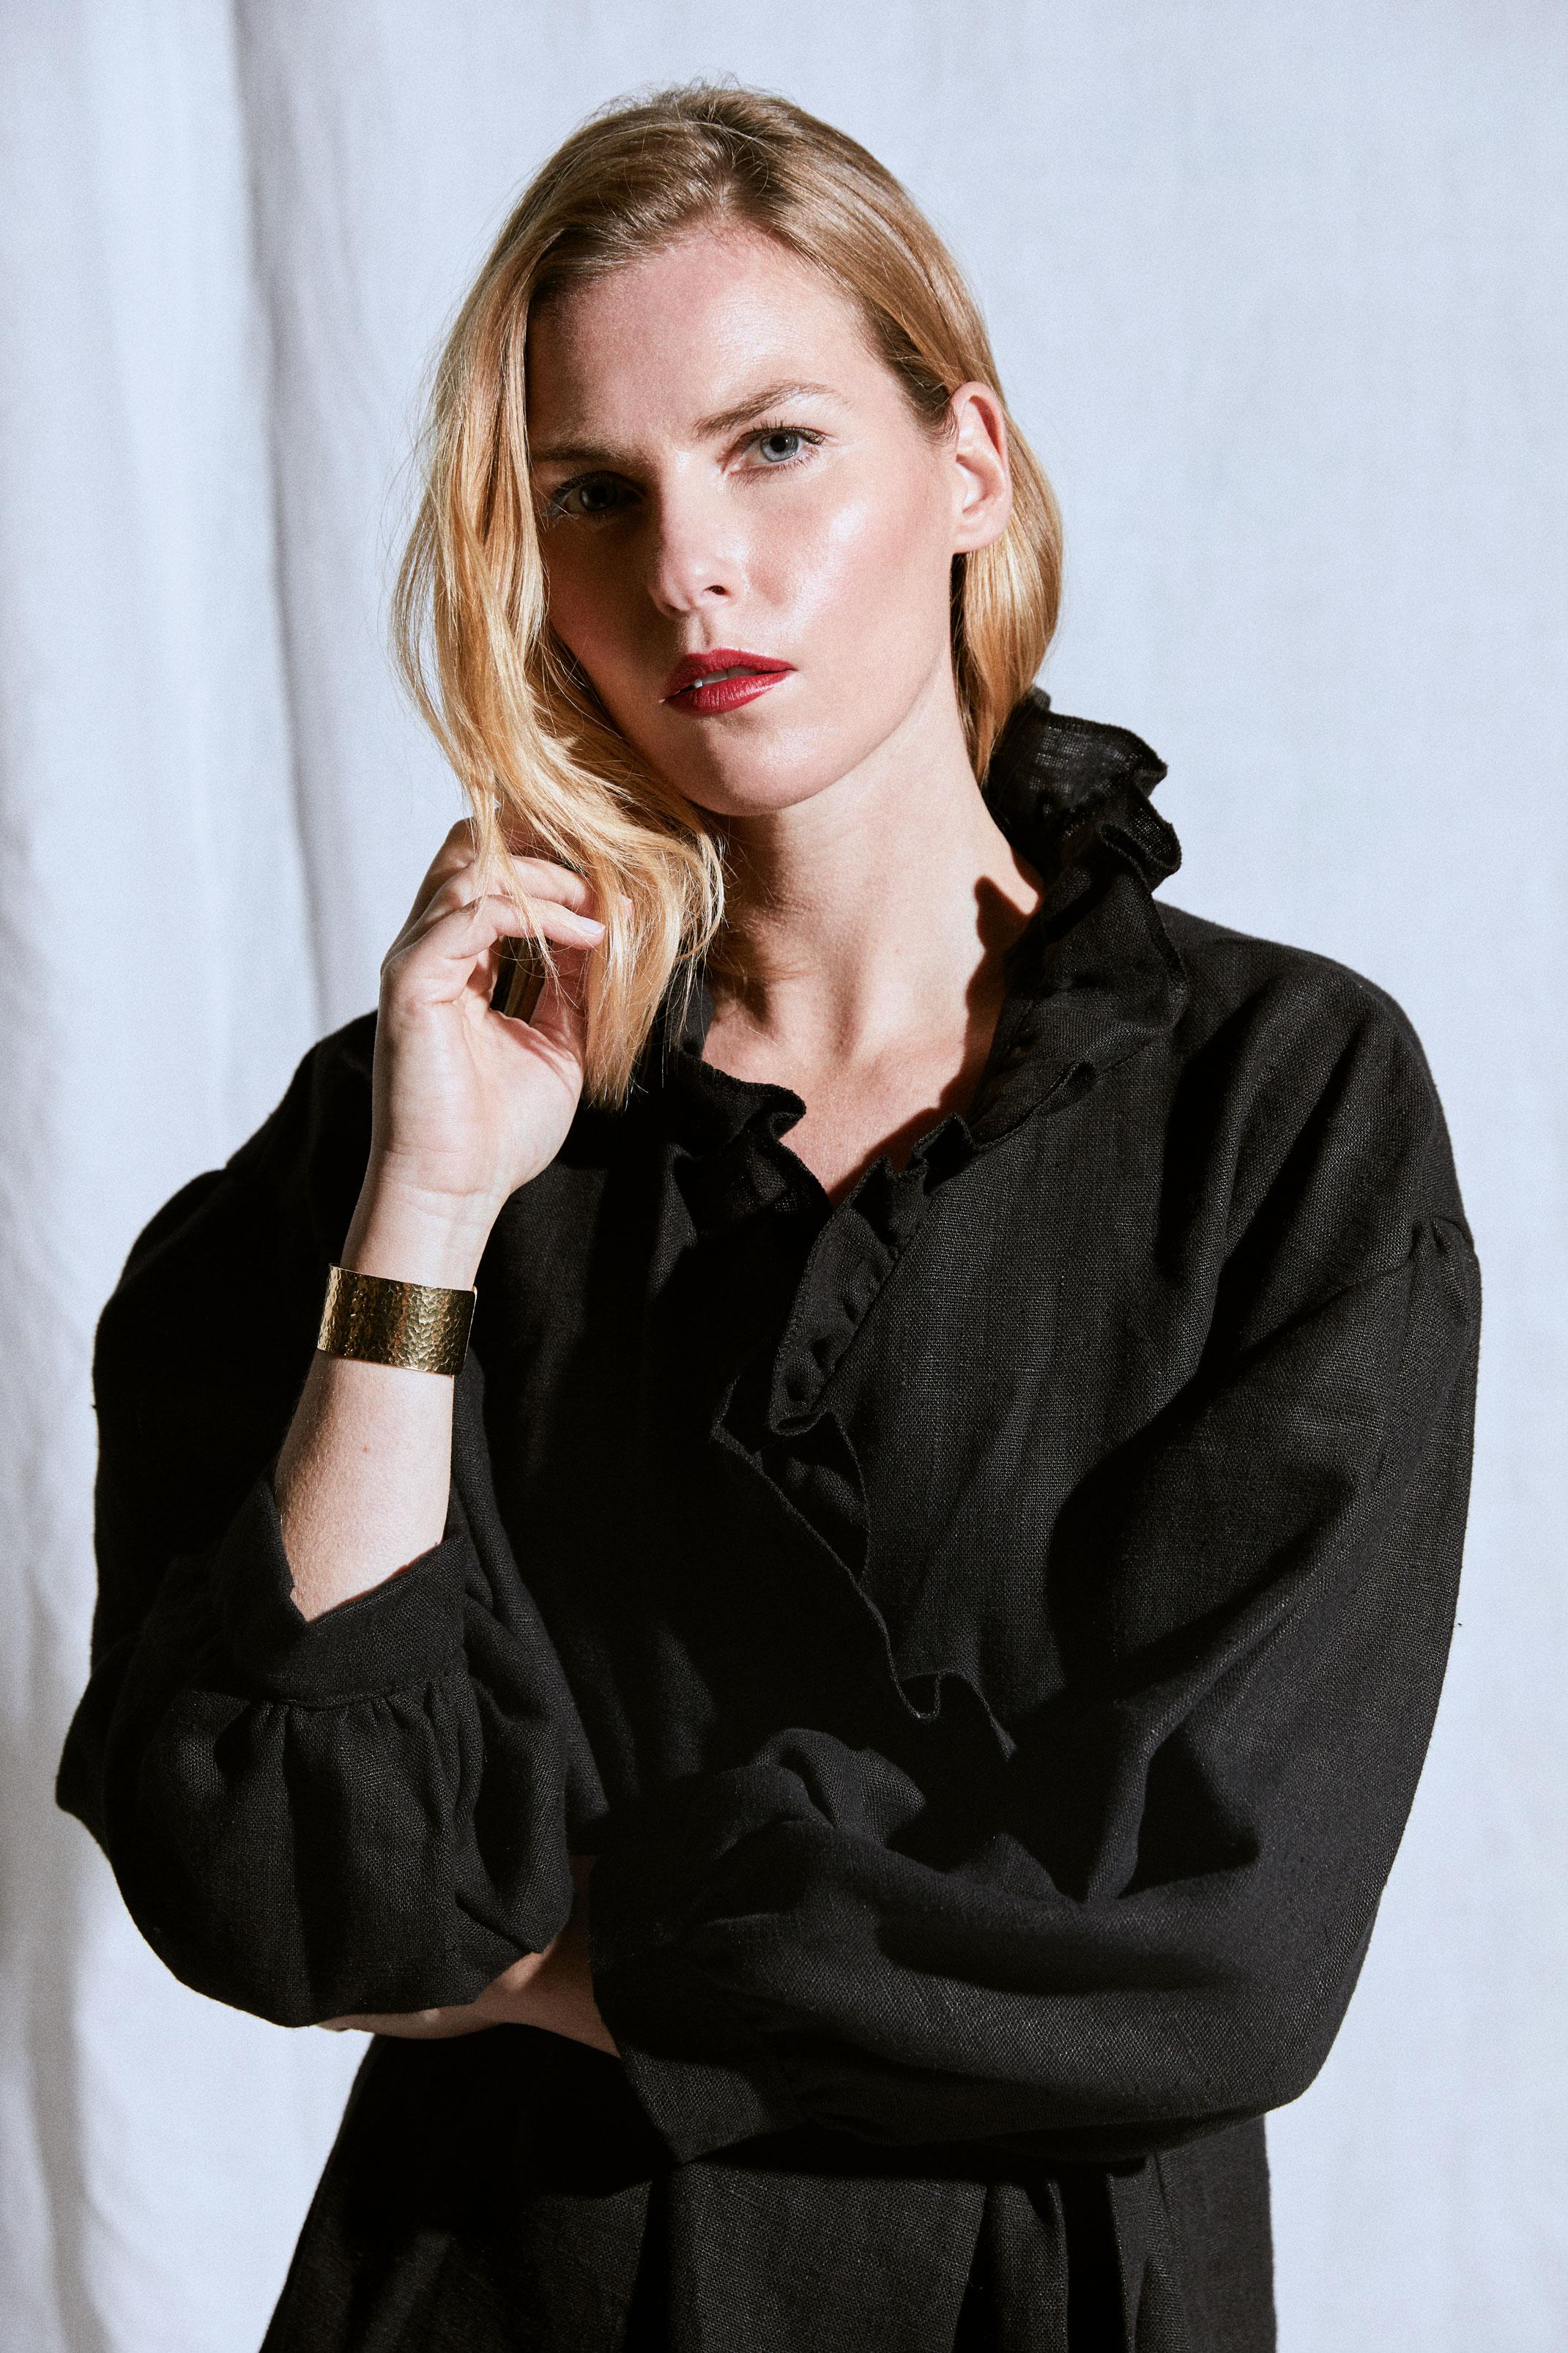 Photographe ecommerce dans la mode en bretagne